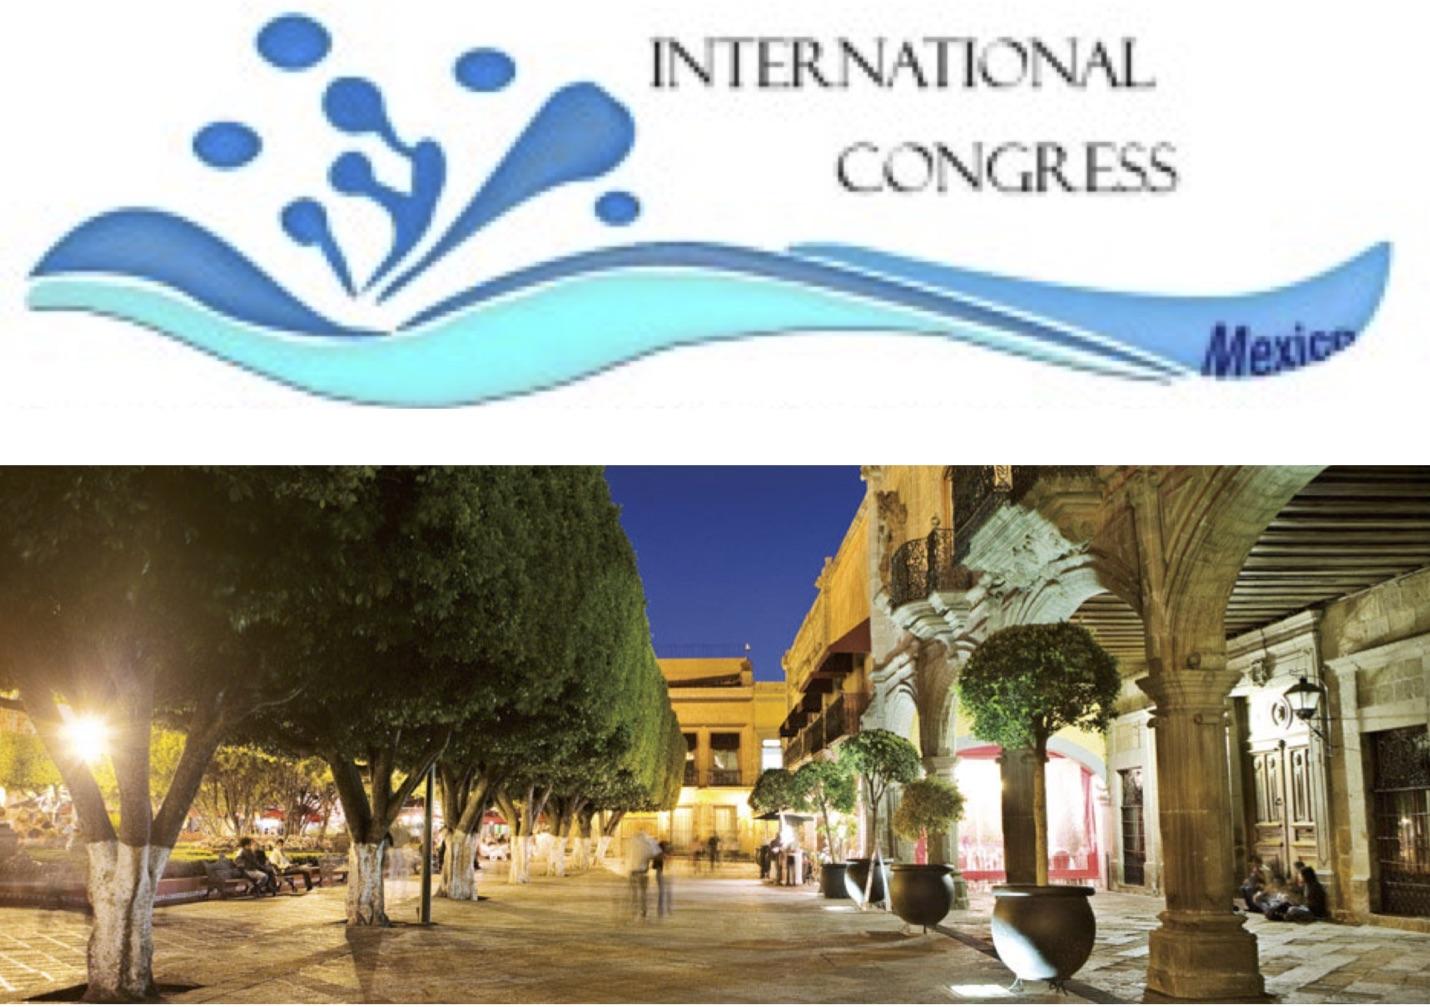 2016 International AquaCongress